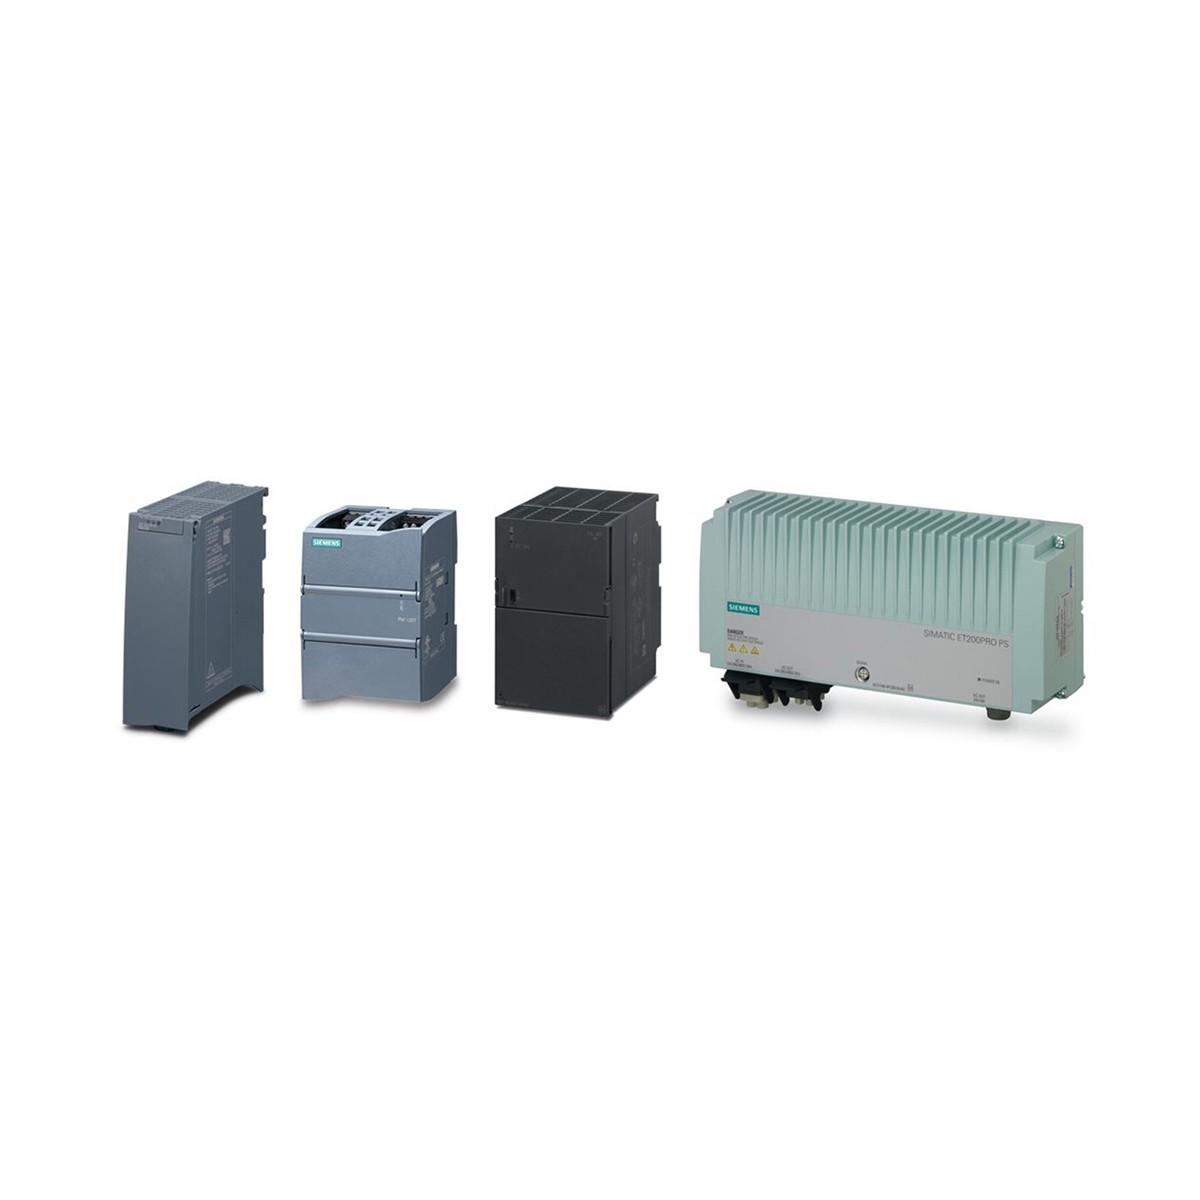 SIMATIC-design power supplies   Power supplies   Siemens